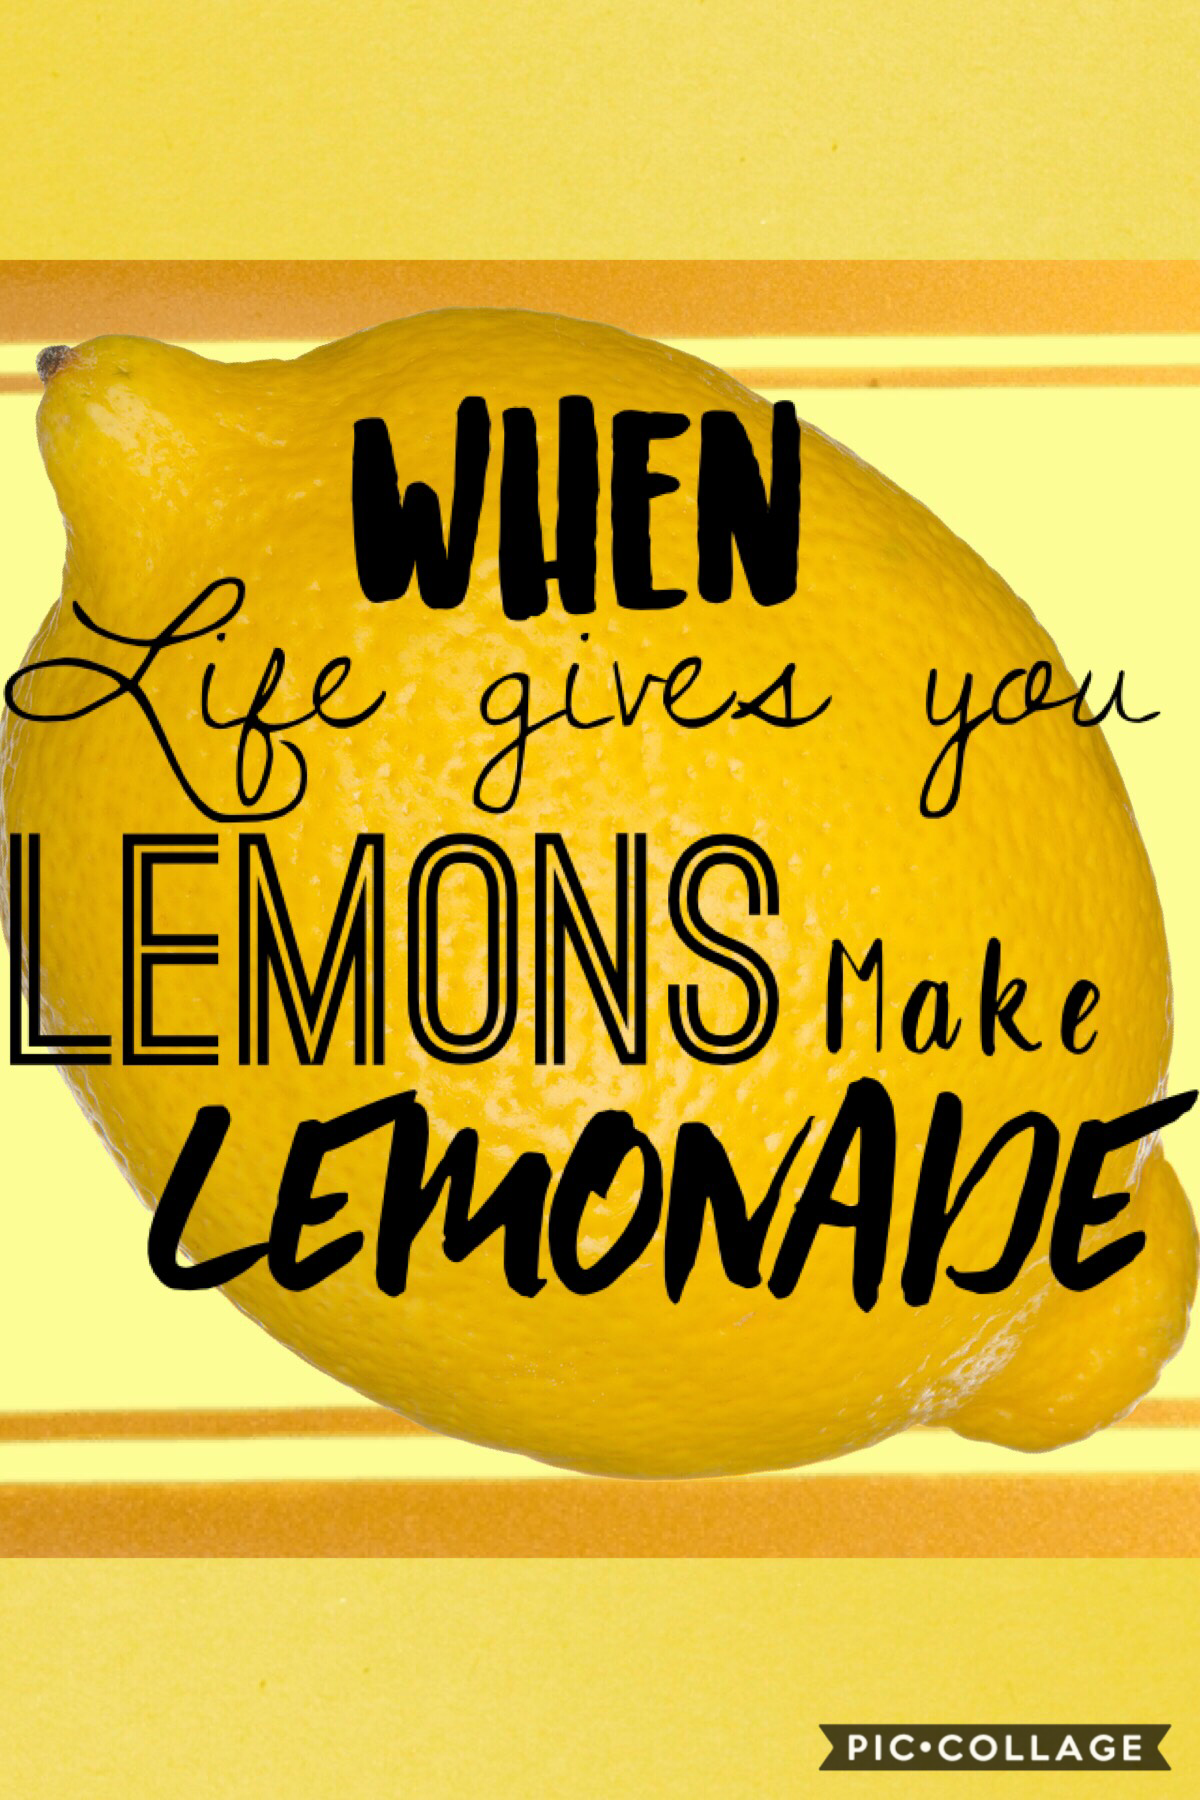 ~Fun Fact: I love strawberry lemonade ~